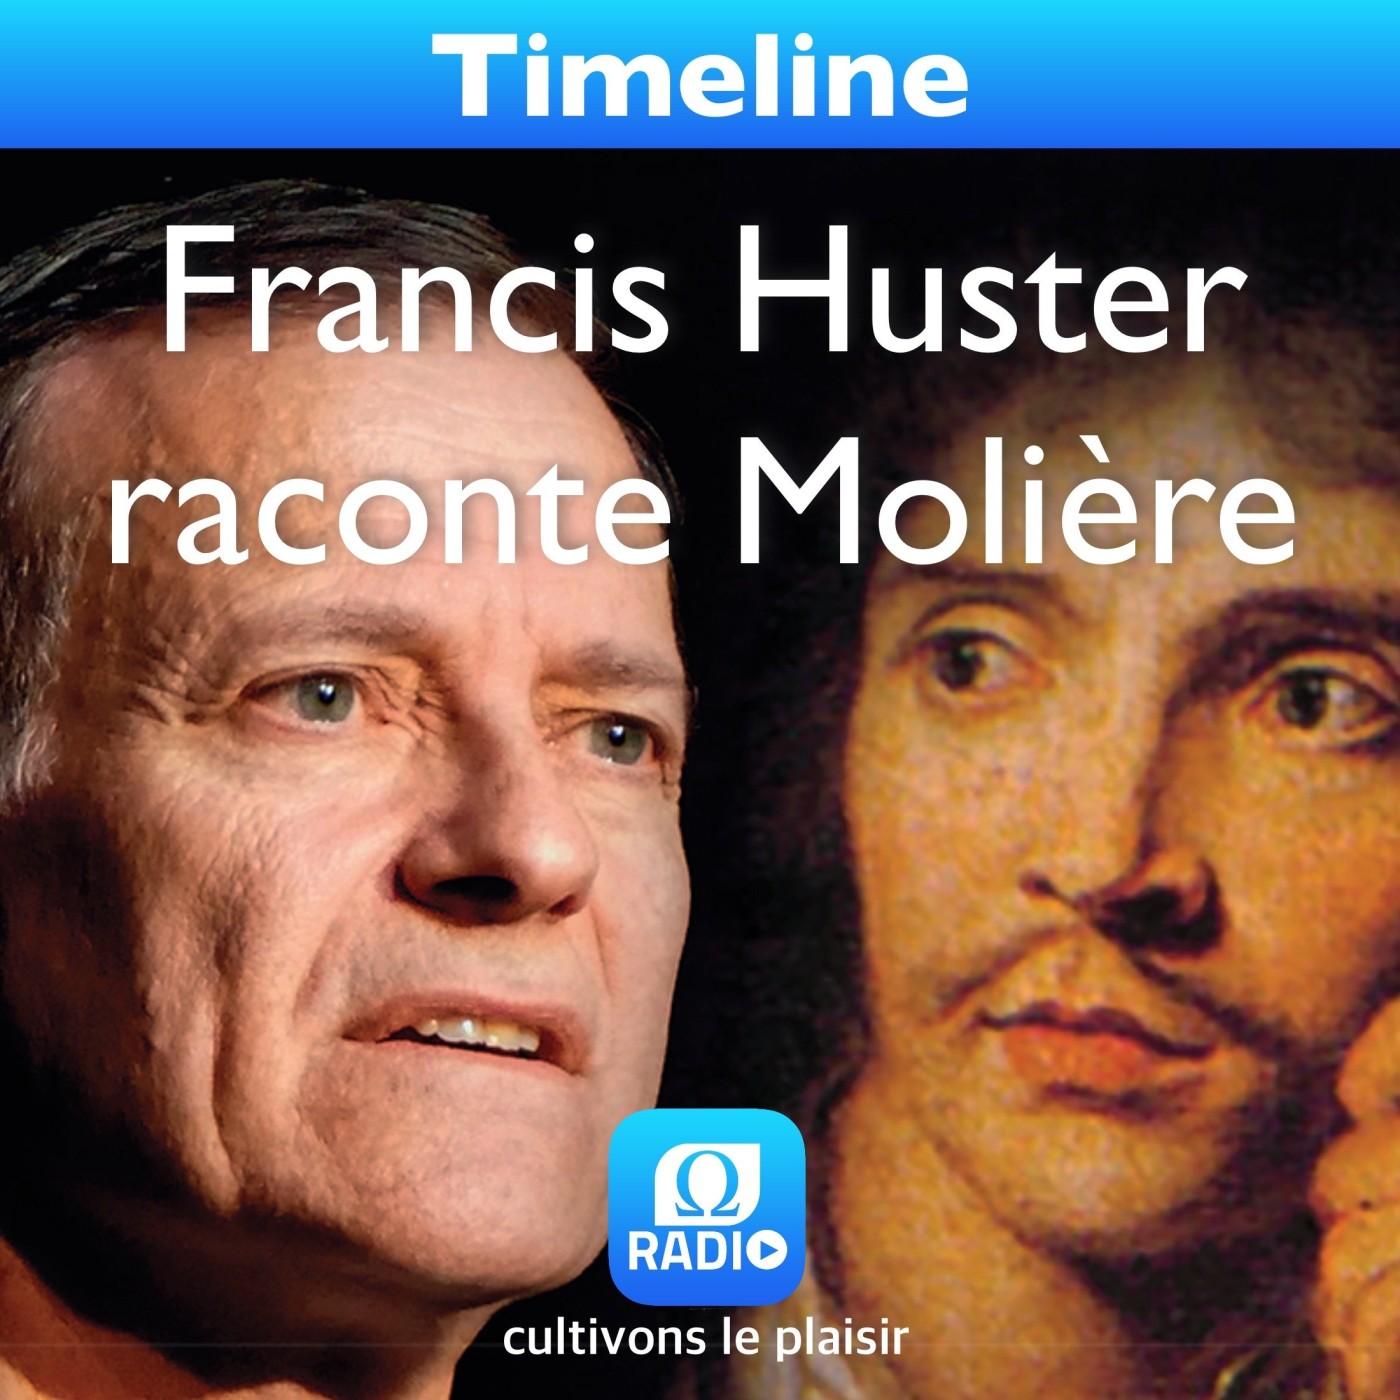 Francis Huster raconte Molière